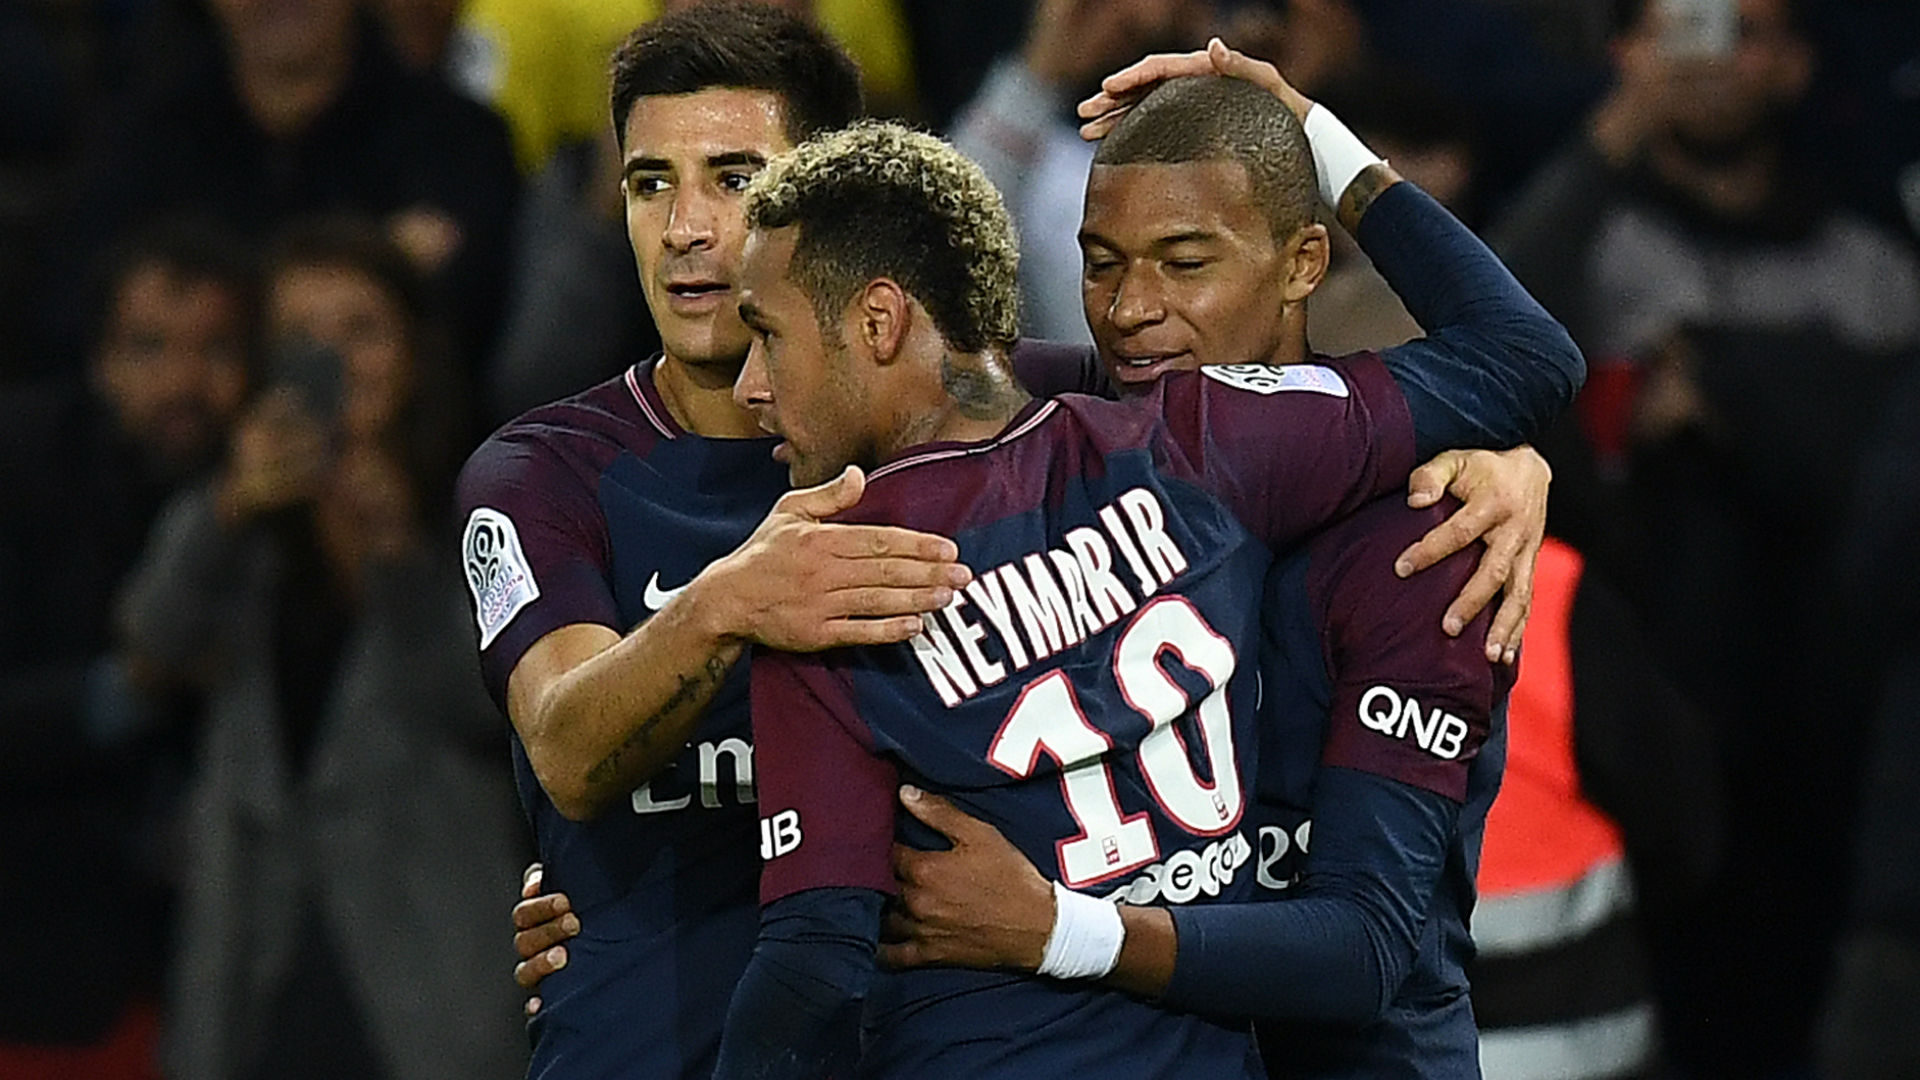 Kylian Mbappe Yuri Berchiche Neymar PSG Lyon Ligue 1 17092017